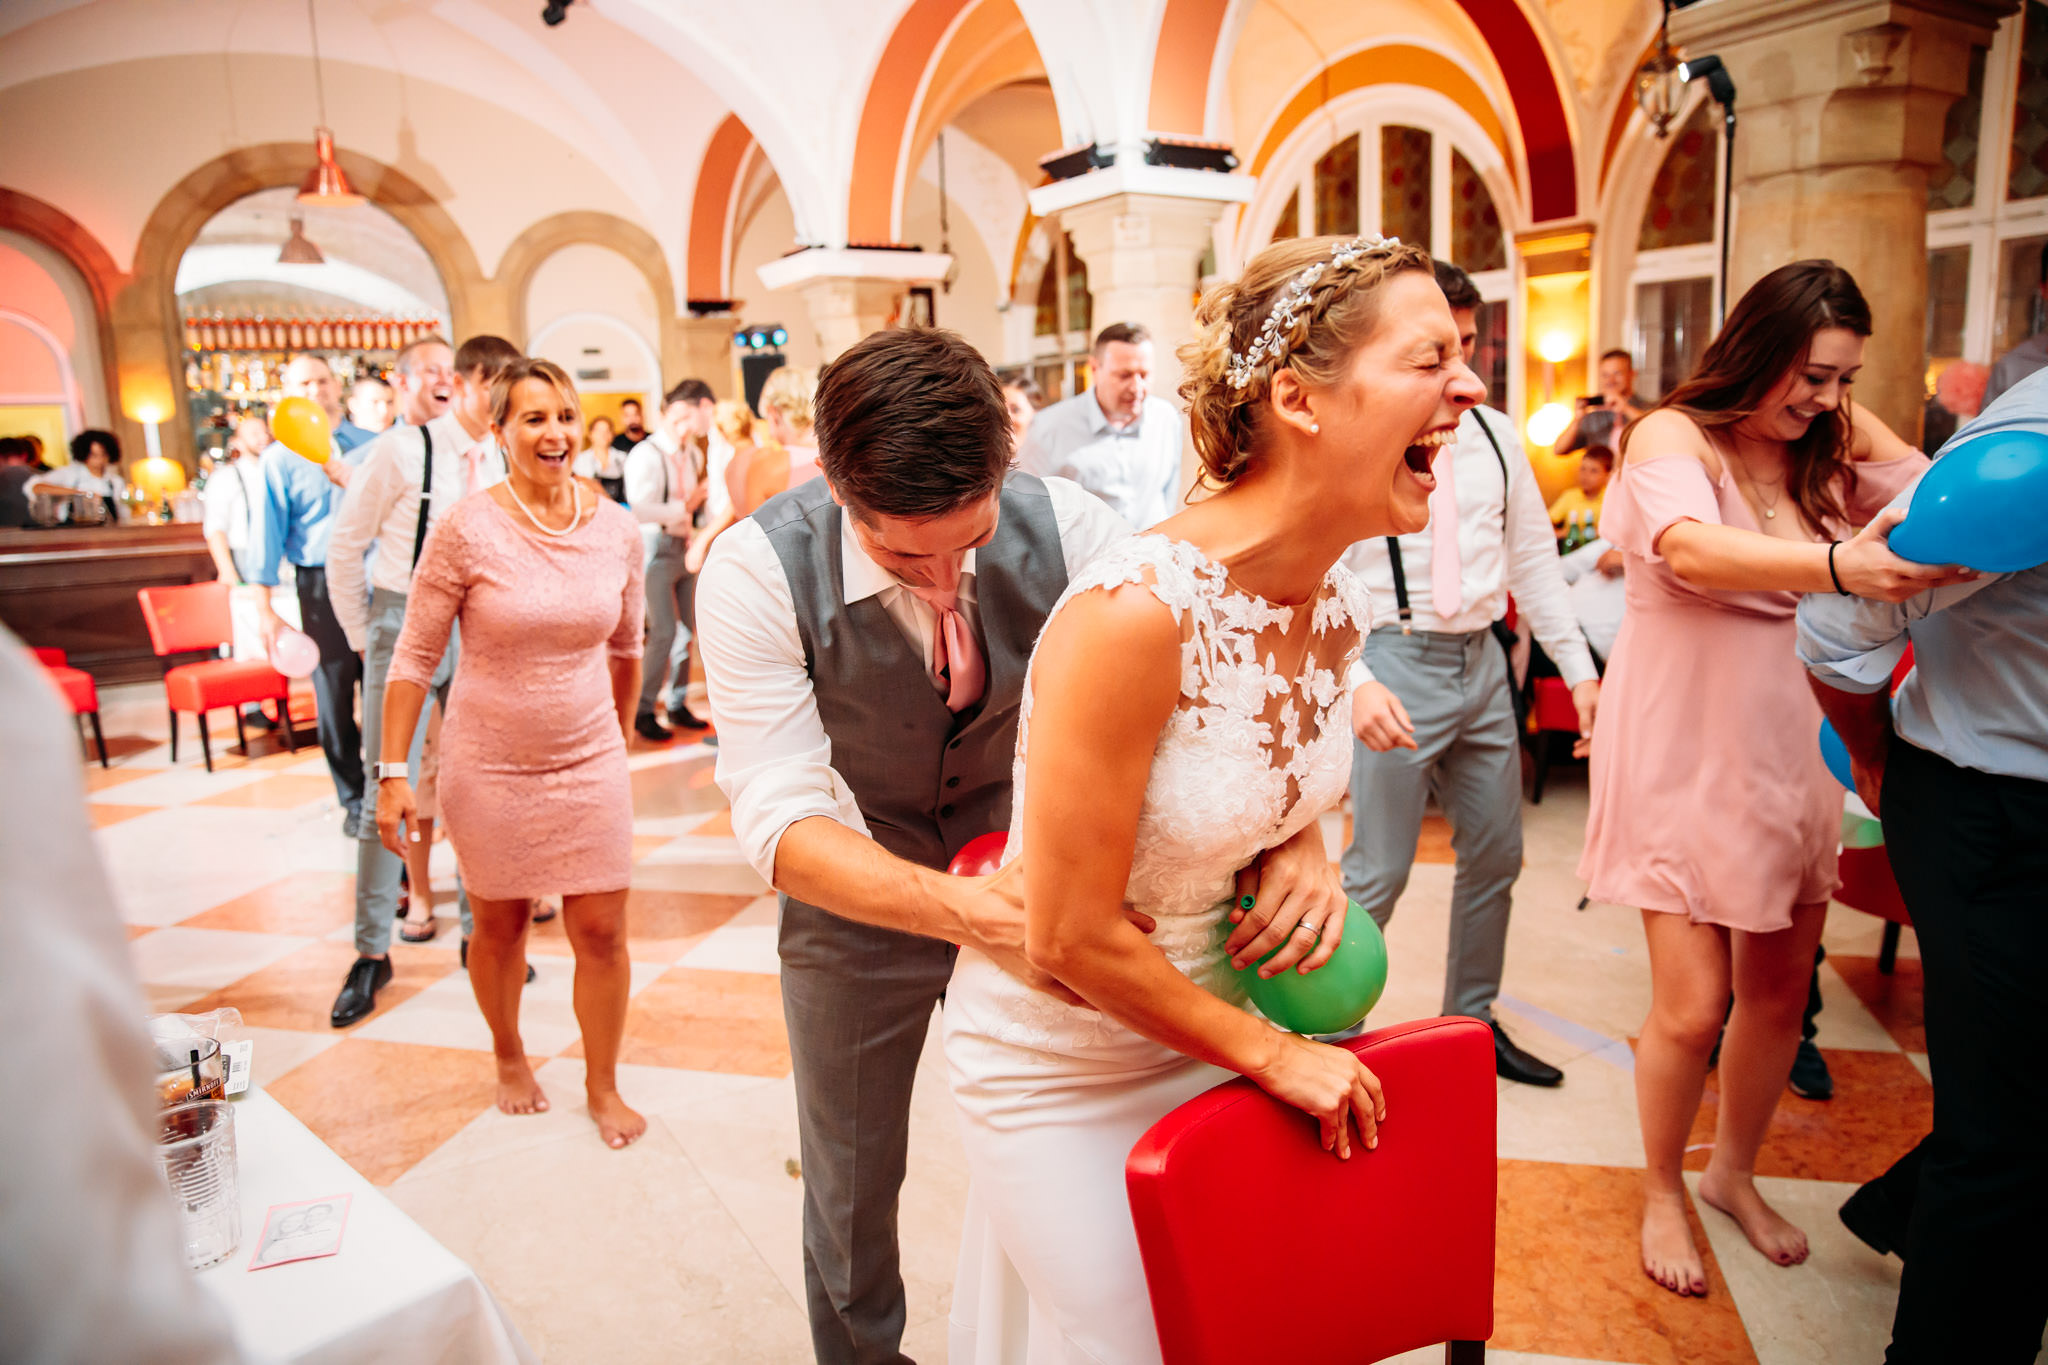 180818_Hochzeit_german_american_grunewald_berlin_locanda_12_apostoli_wedding_web_0026.jpg